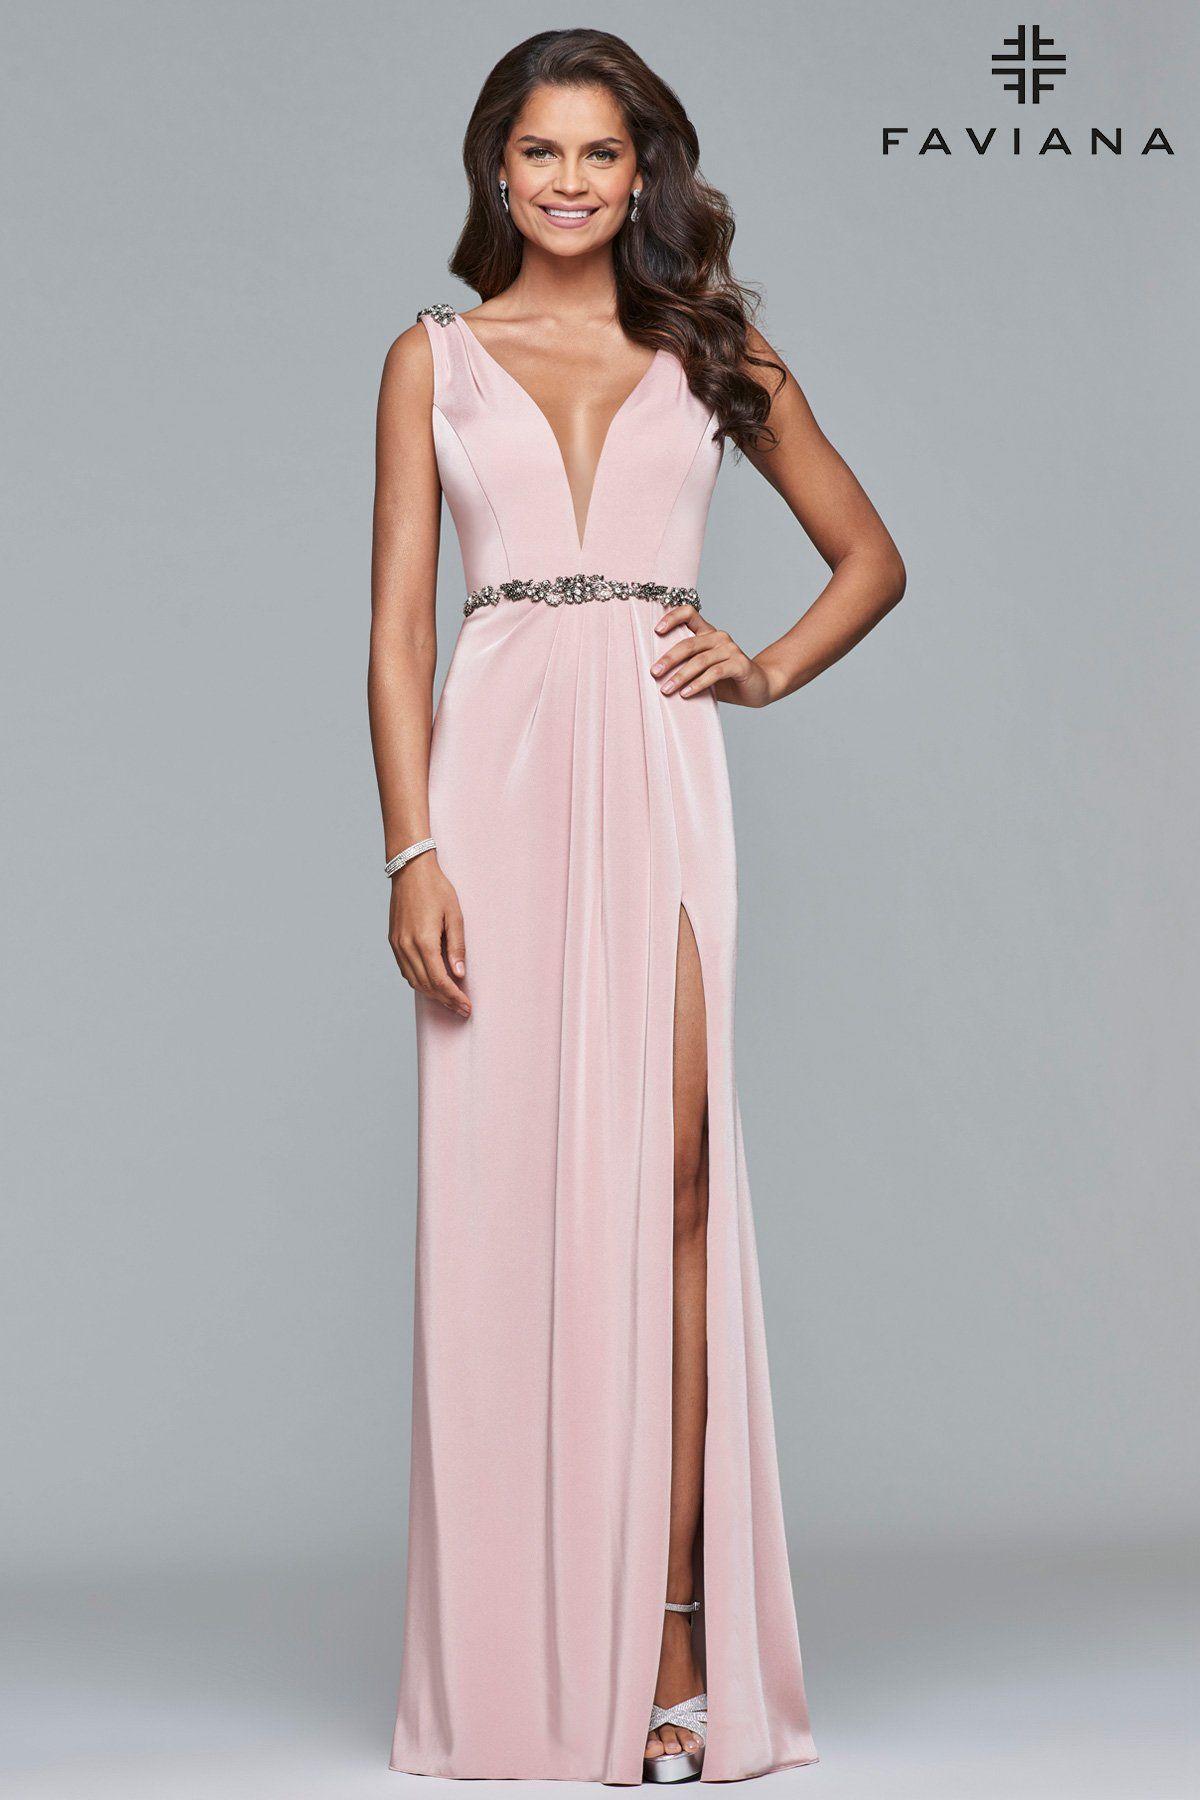 Faviana s appeal online shopping pinterest dresses